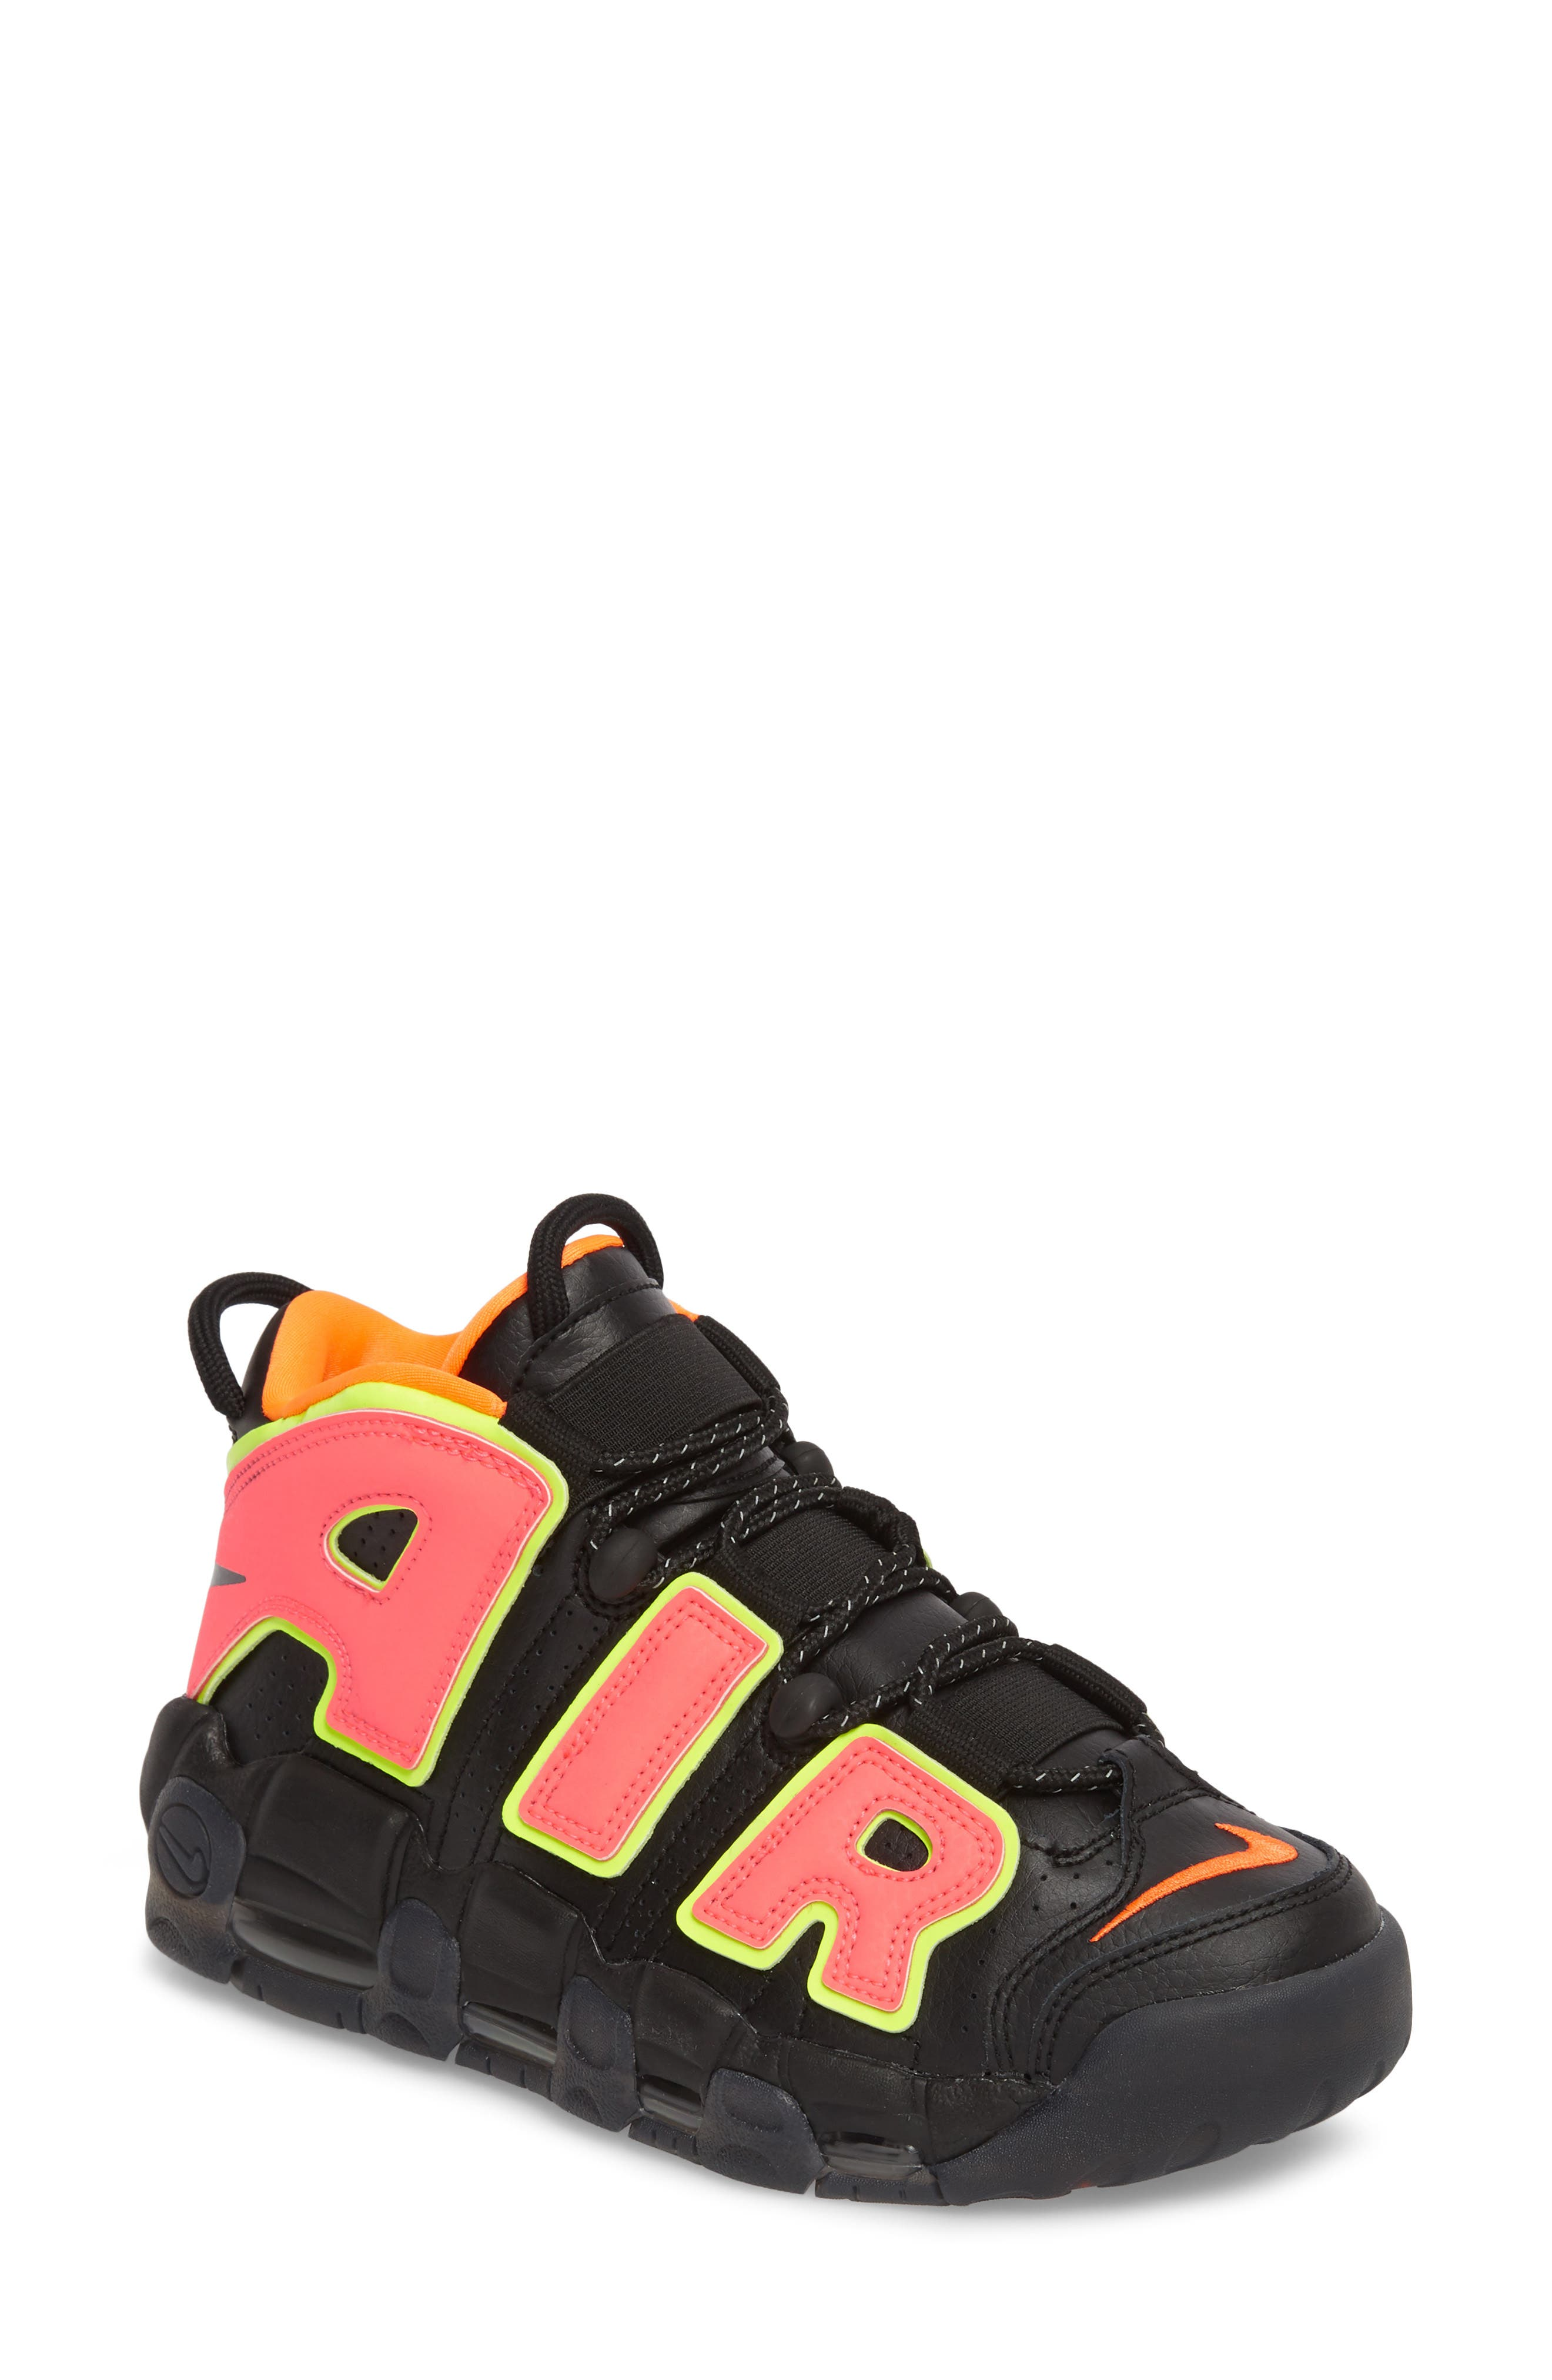 Air More Uptempo Sneaker,                             Main thumbnail 1, color,                             Black/ Punch/ Total Orange